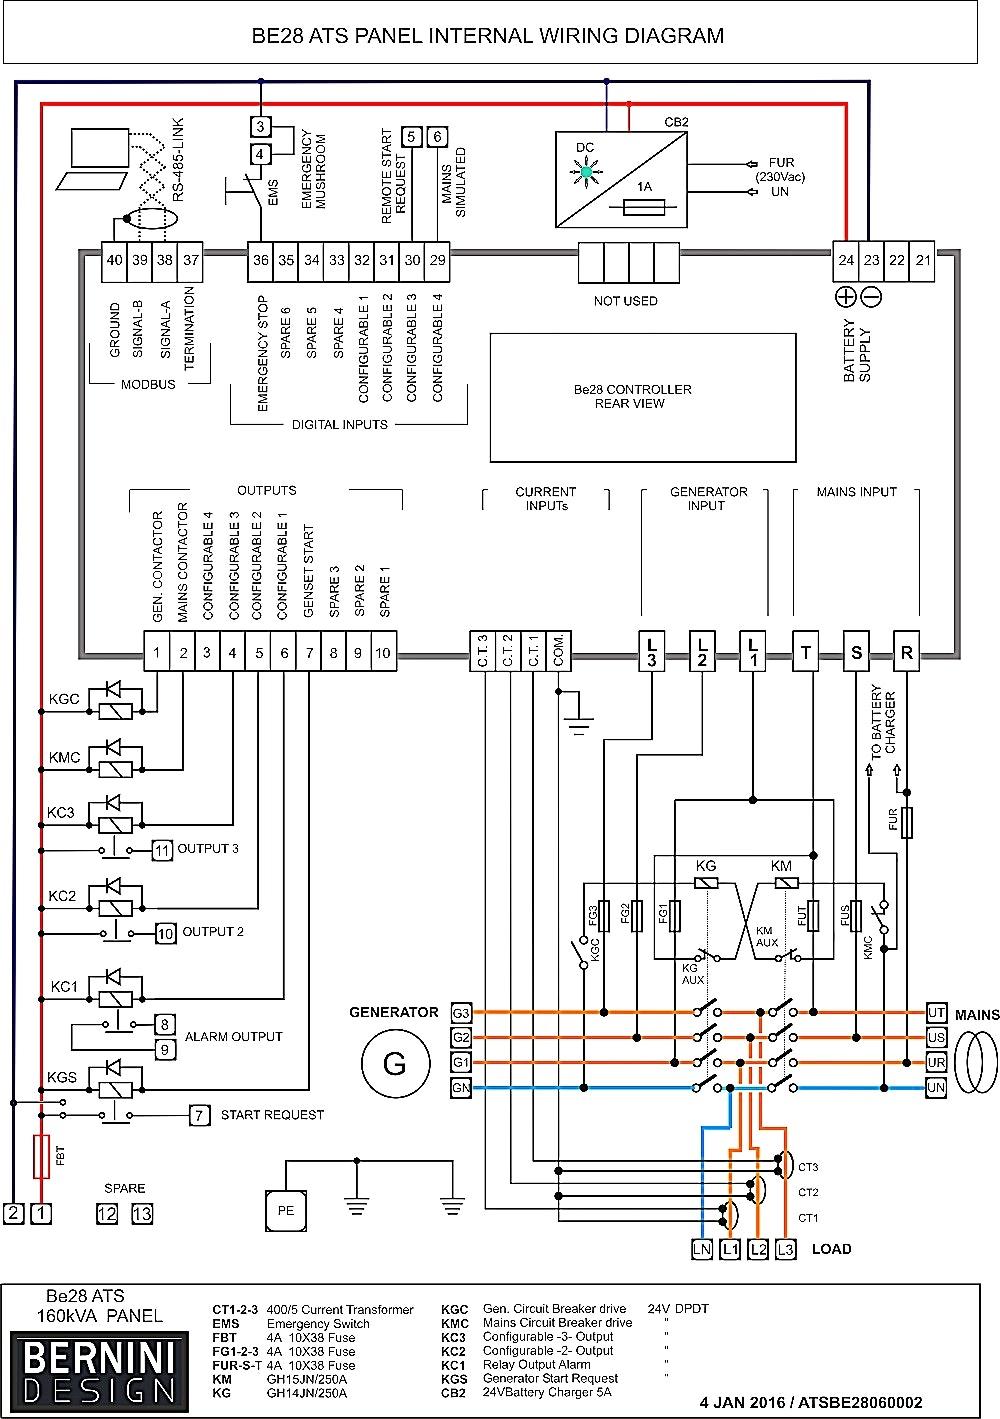 generator transfer switch wiring diagram Collection-asco automatic transfer switch wiring diagram Generac Automatic Transfer Switch Wiring Diagram Simple Design Between 4-g